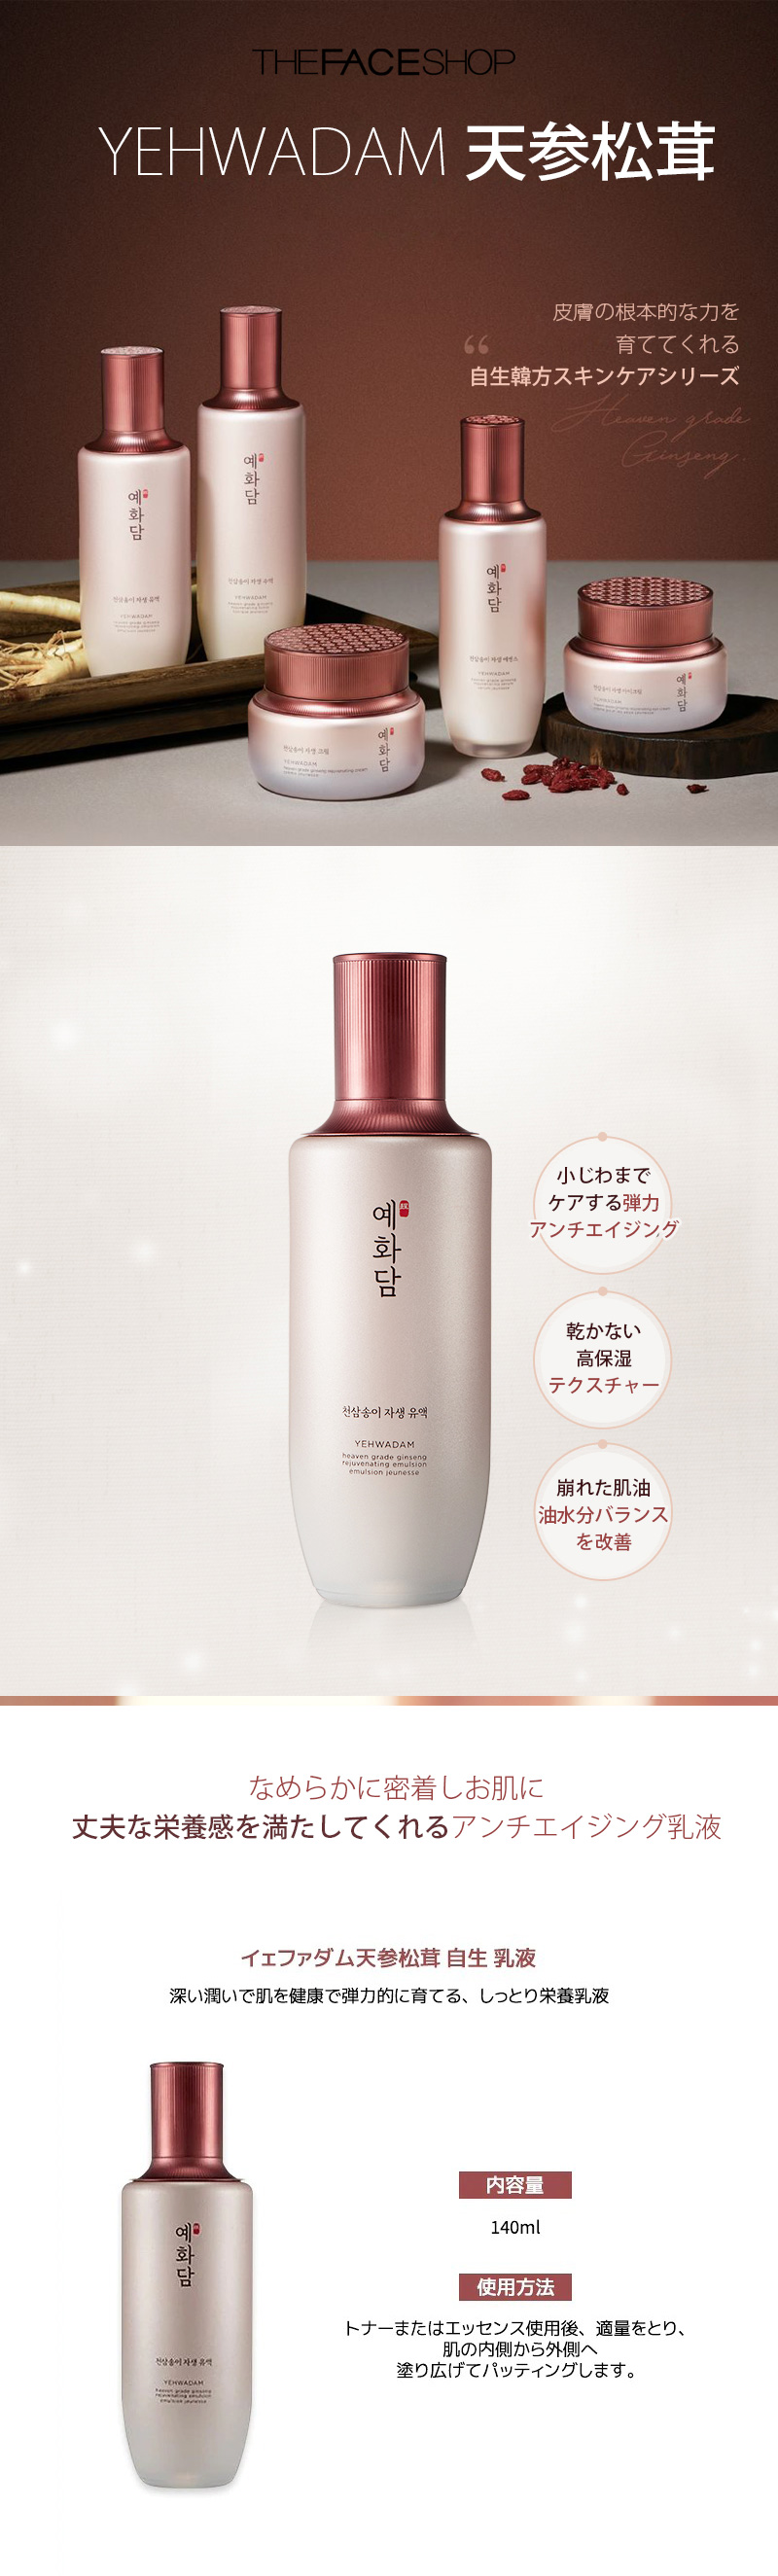 THE FACE SHOP(フェイスショップ) イェファダン 天参松茸 自生 乳液 140ml